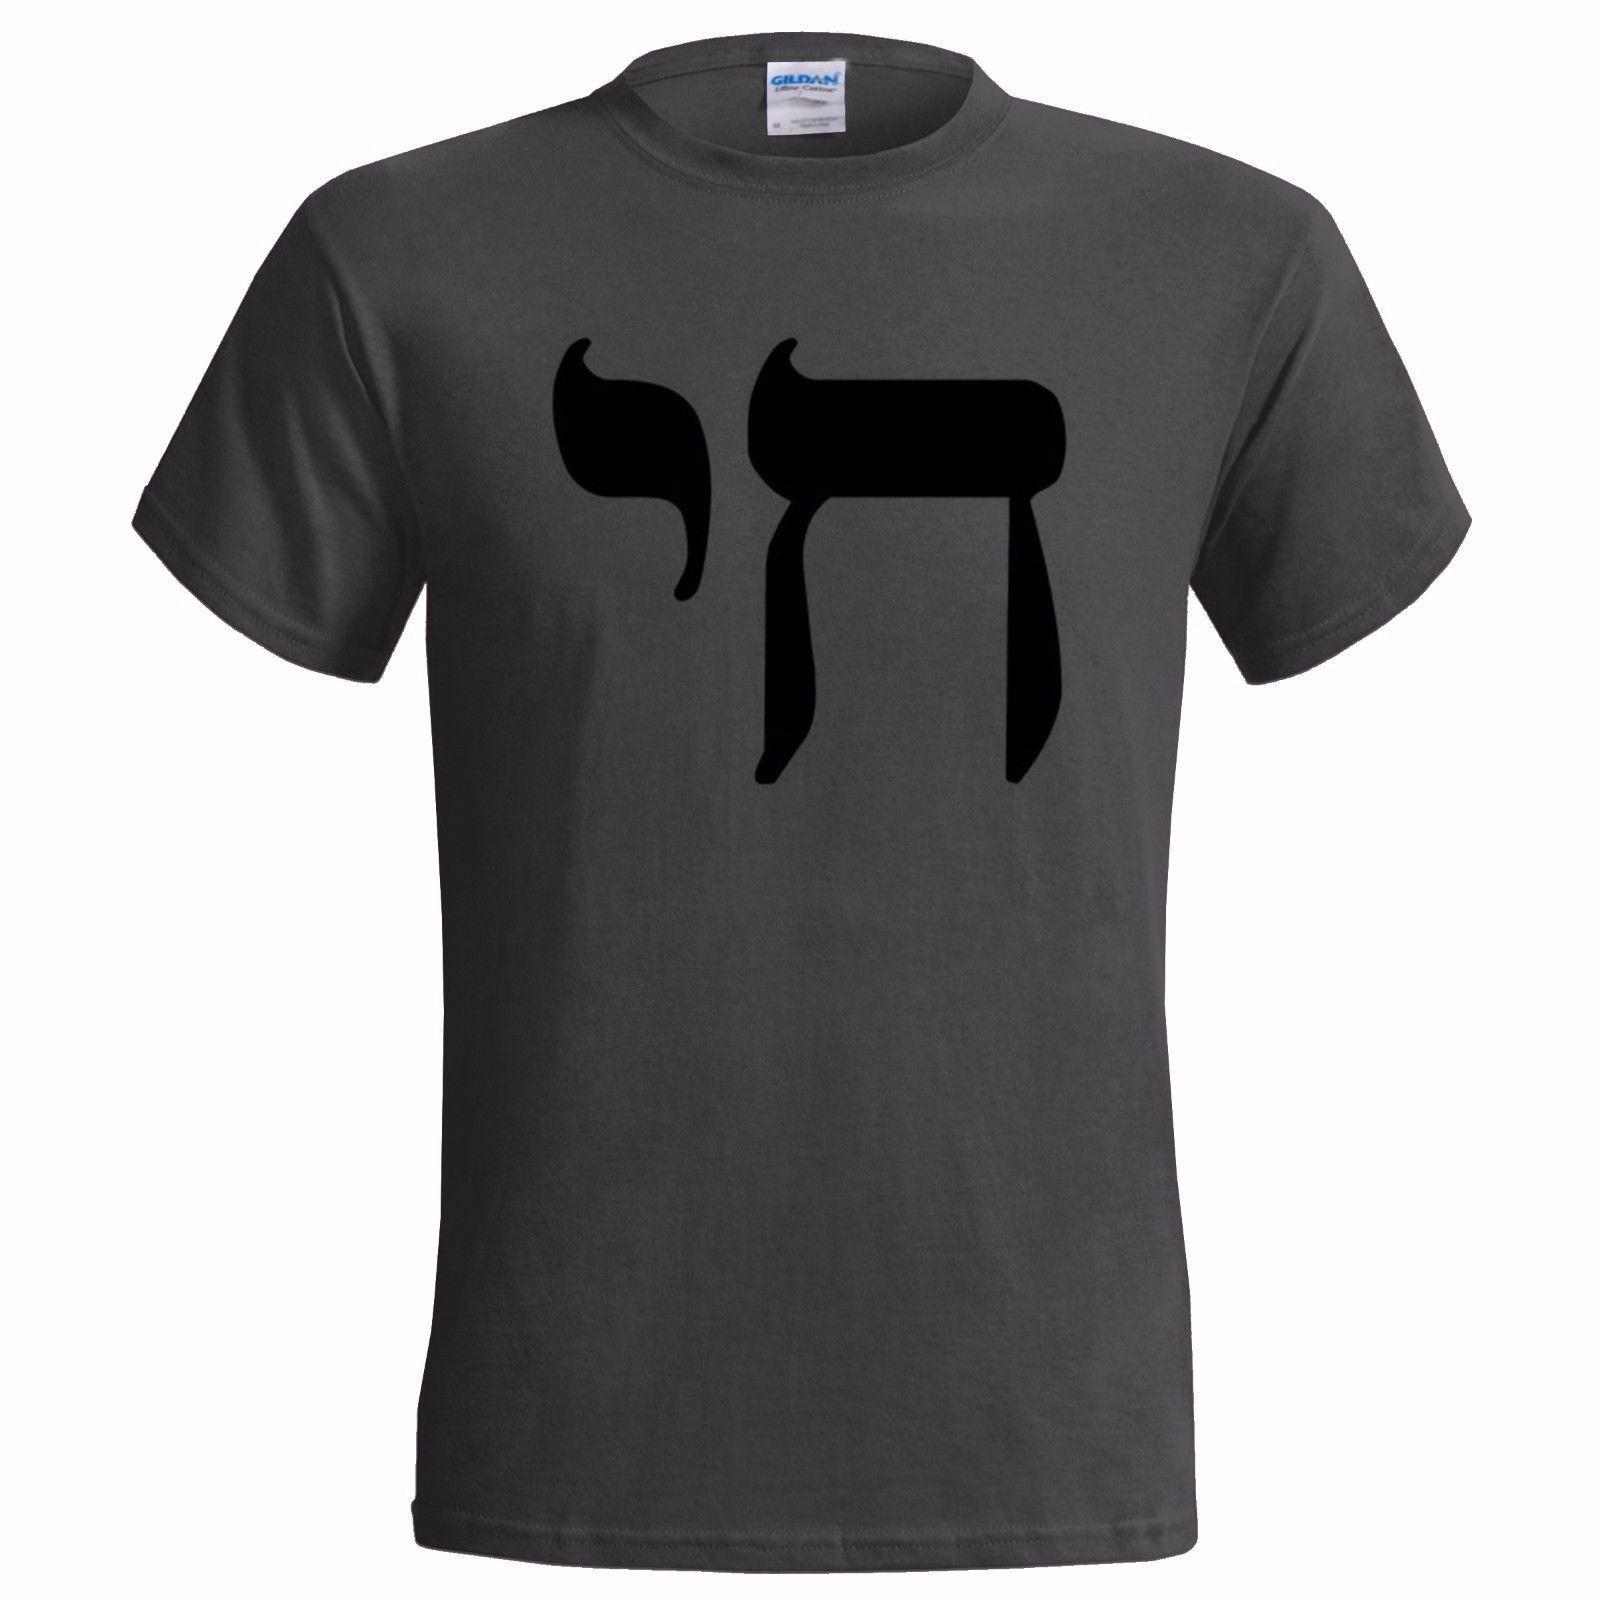 ef73b2aaef Chai Symbol Mens T Shirt Hebrew Life Jewish Jew Sign Yiddish Judaism New T  Shirts Funny Tops Tee New Unisex Funny Tops Design Own T Shirt T Shirt  Making ...